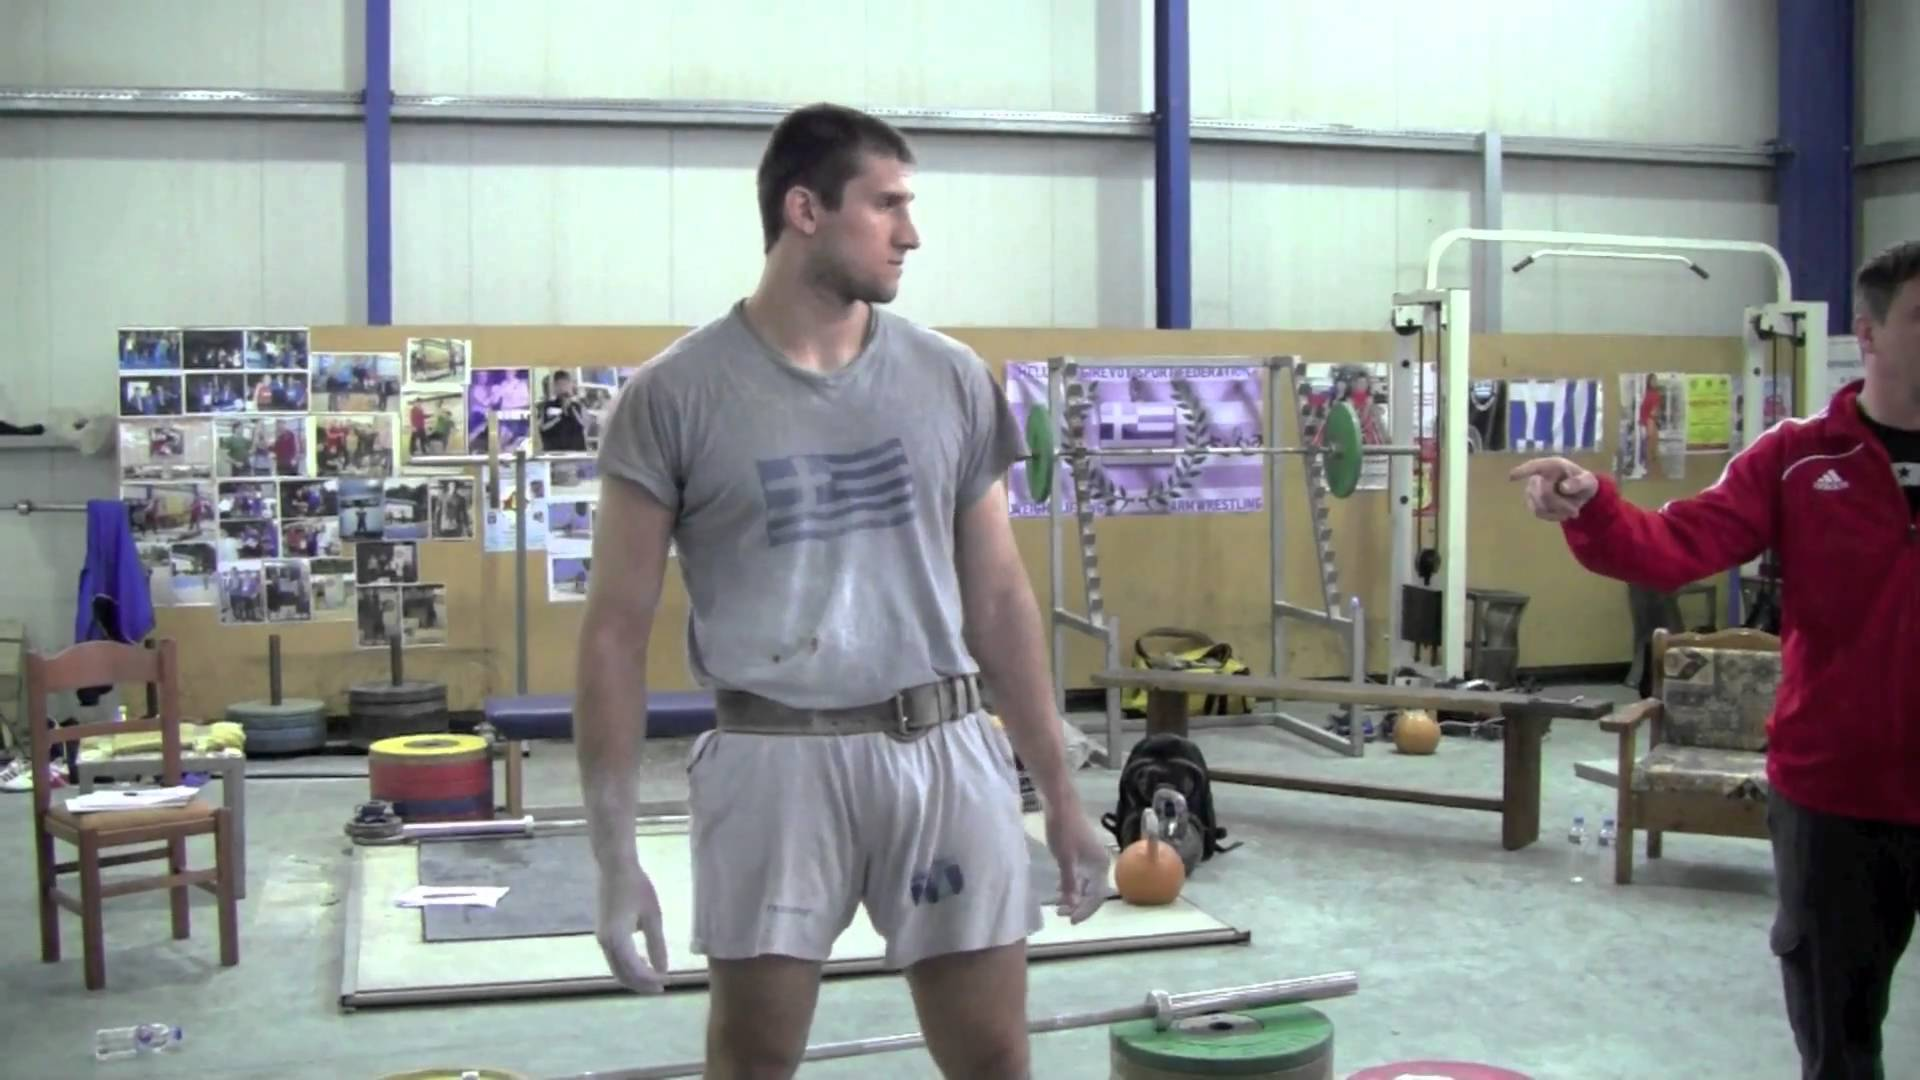 90kg / 200lb Super Kettlebell Record